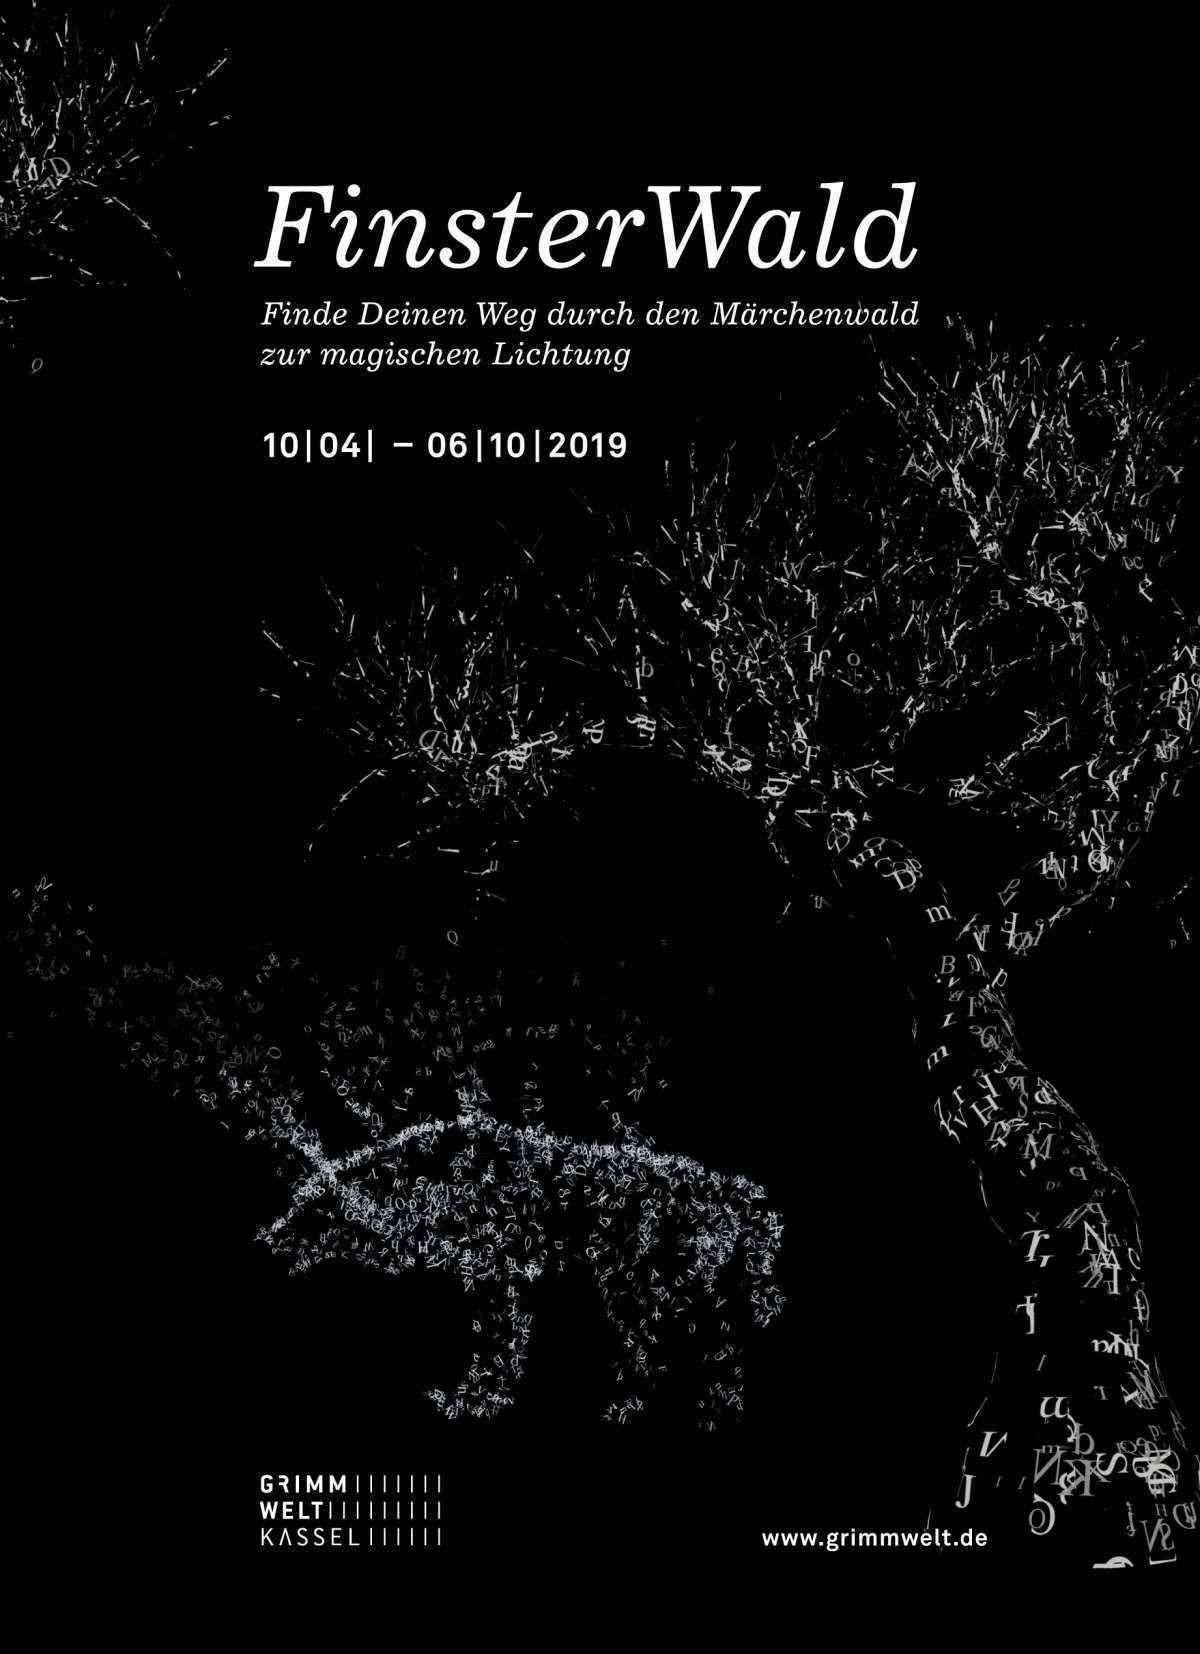 Ww-Terminator: Pianist in den Trümmern - Aeham Ahmad - Grimmwelt Kassel - Kassel